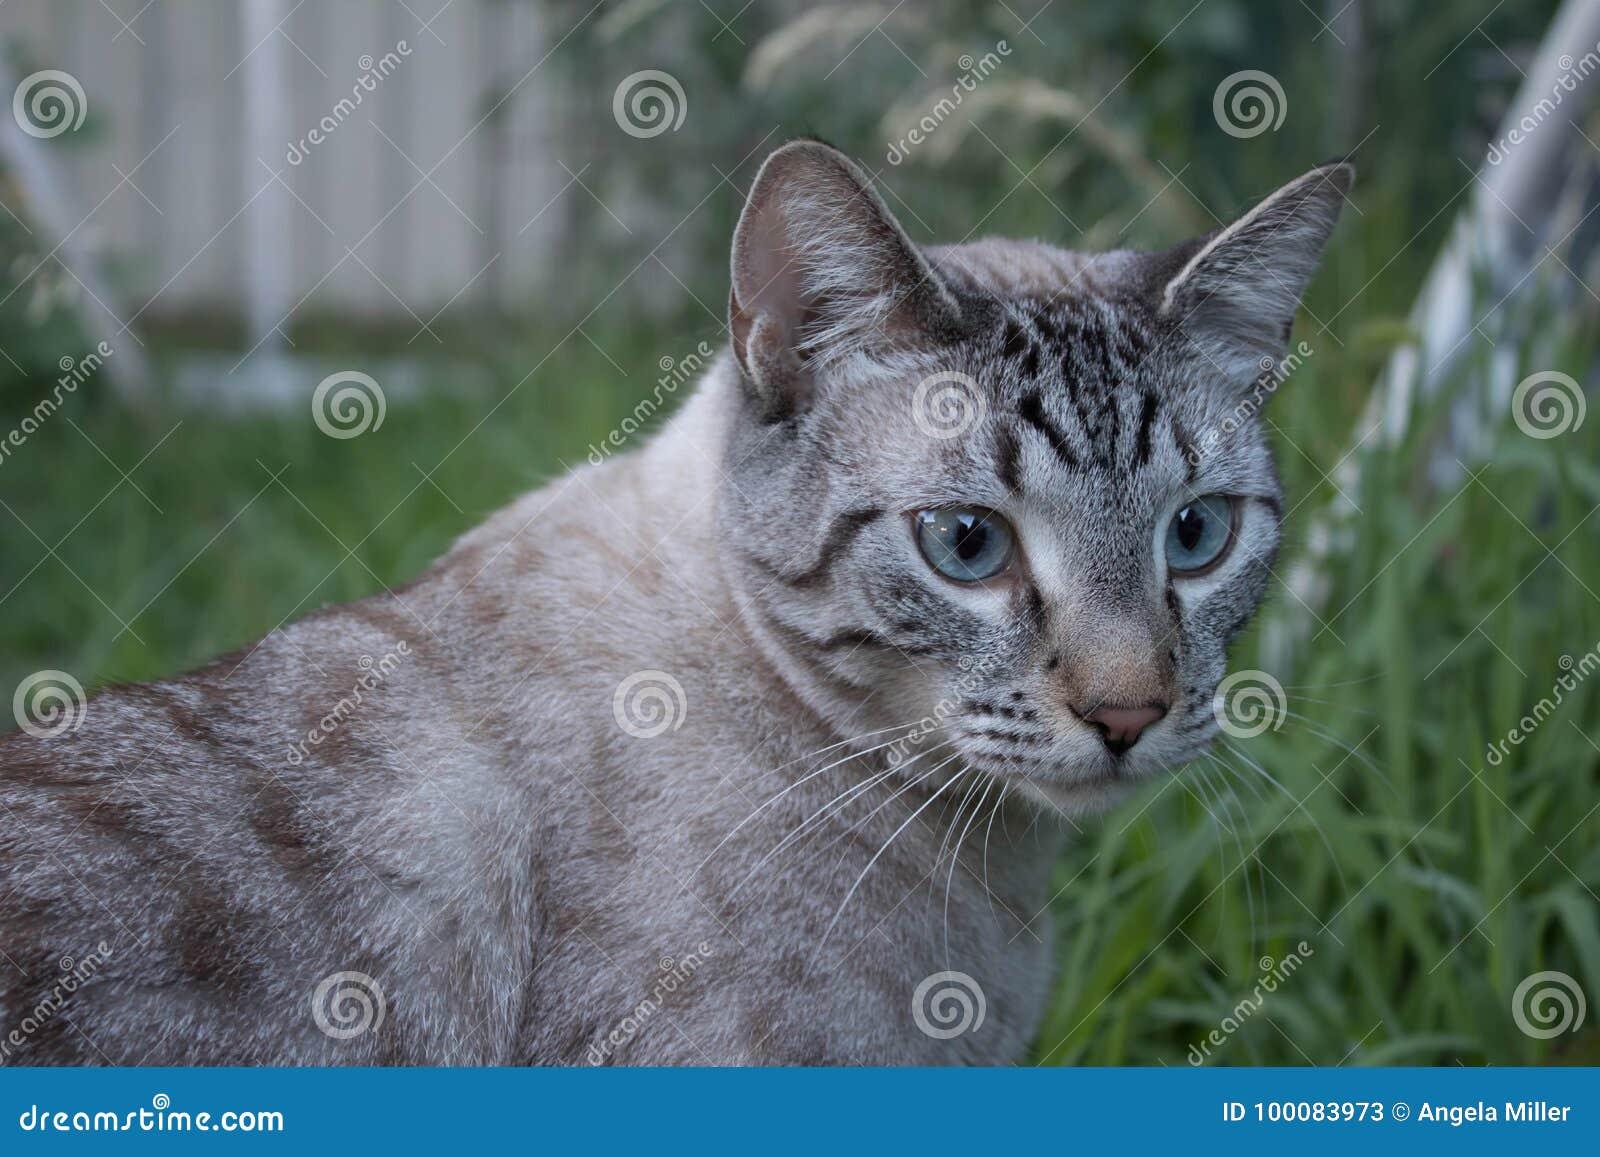 Lynx Point Siamese Cat Outside